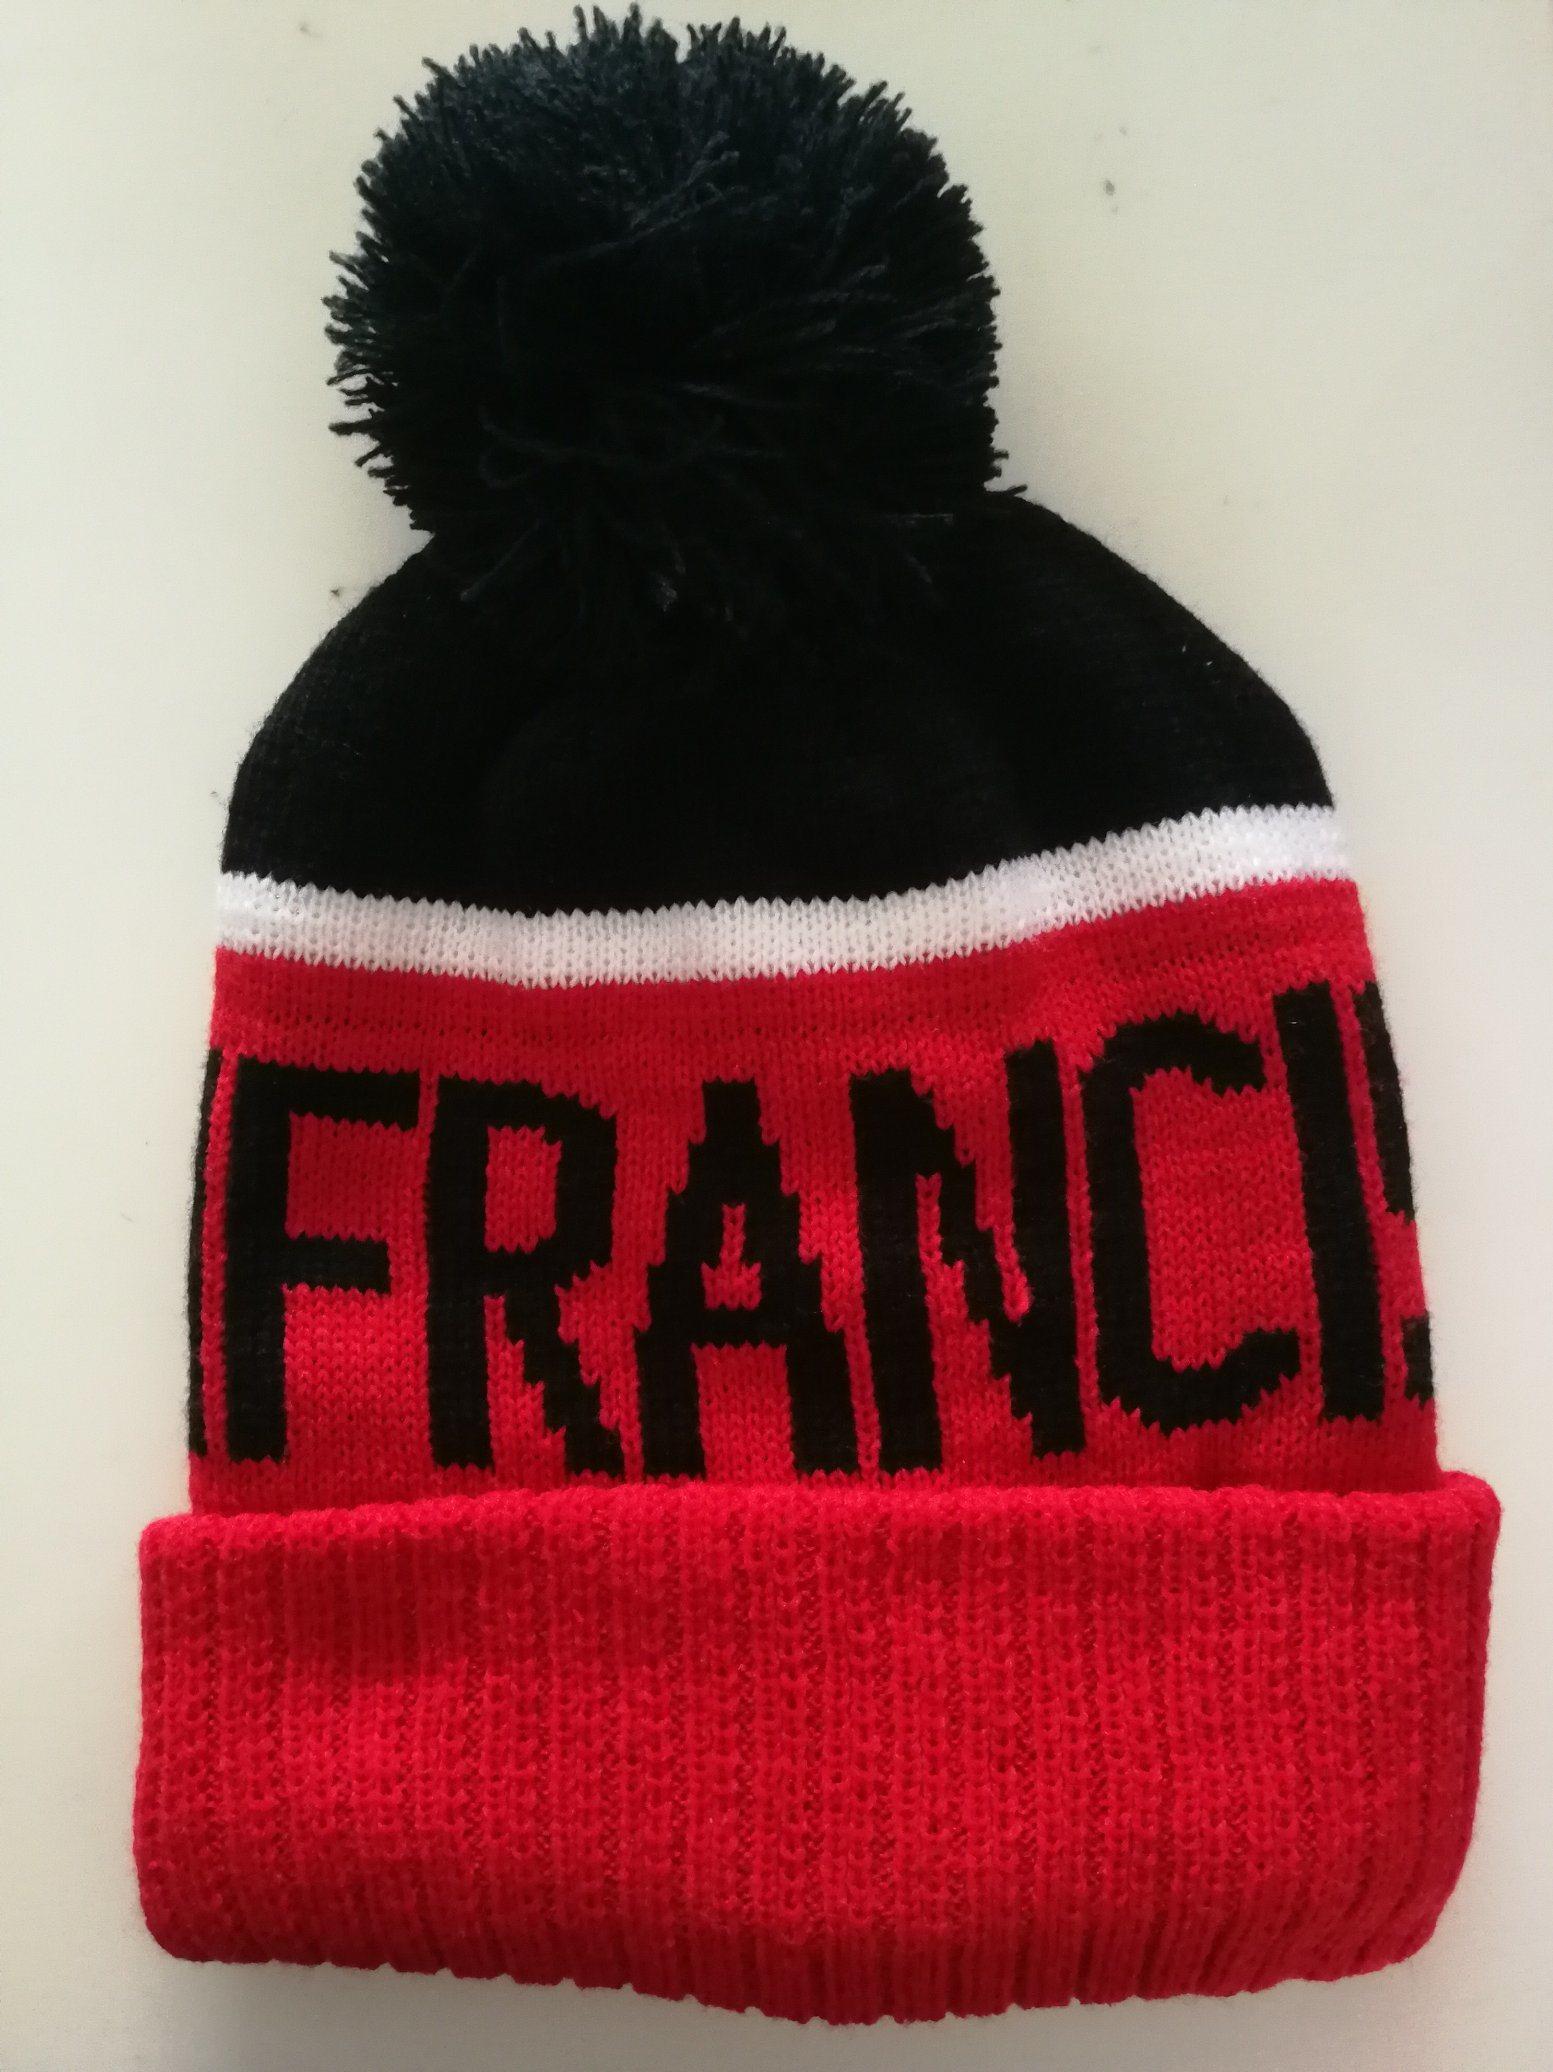 56deeba1301 China Sanfrancisco POM POM Beanie Hat Soft Cable Knit Winter Fleece Lined Skull  Cap Cuff Beanie - China Fashion Cap